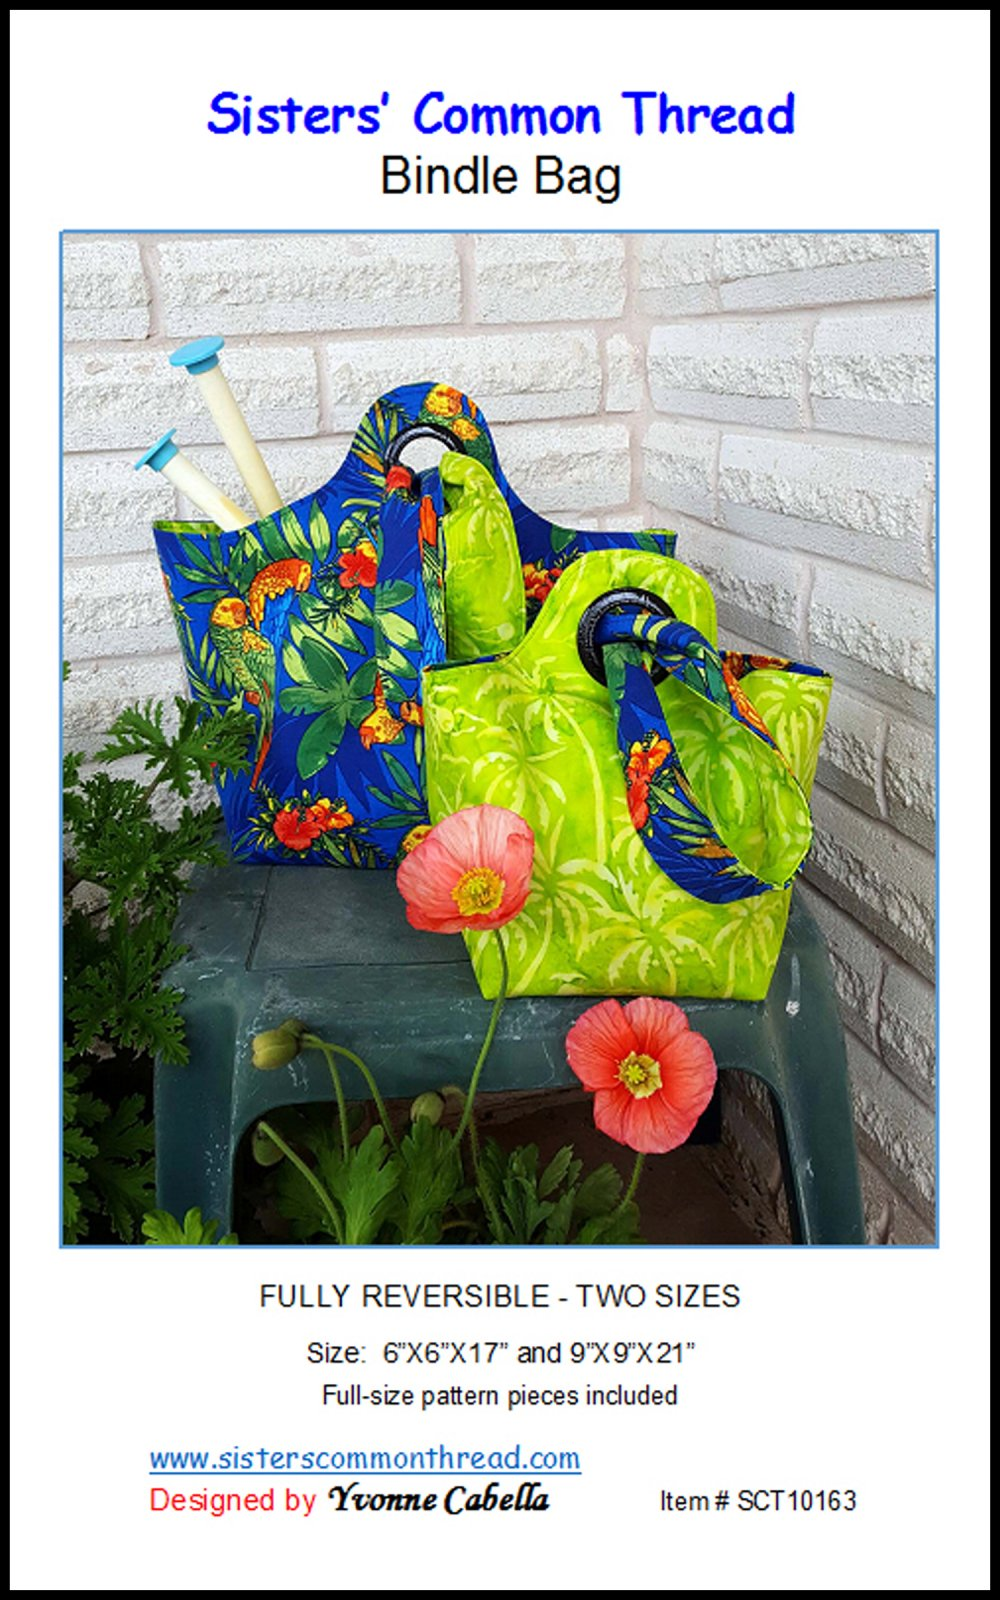 Bindle Bag pattern